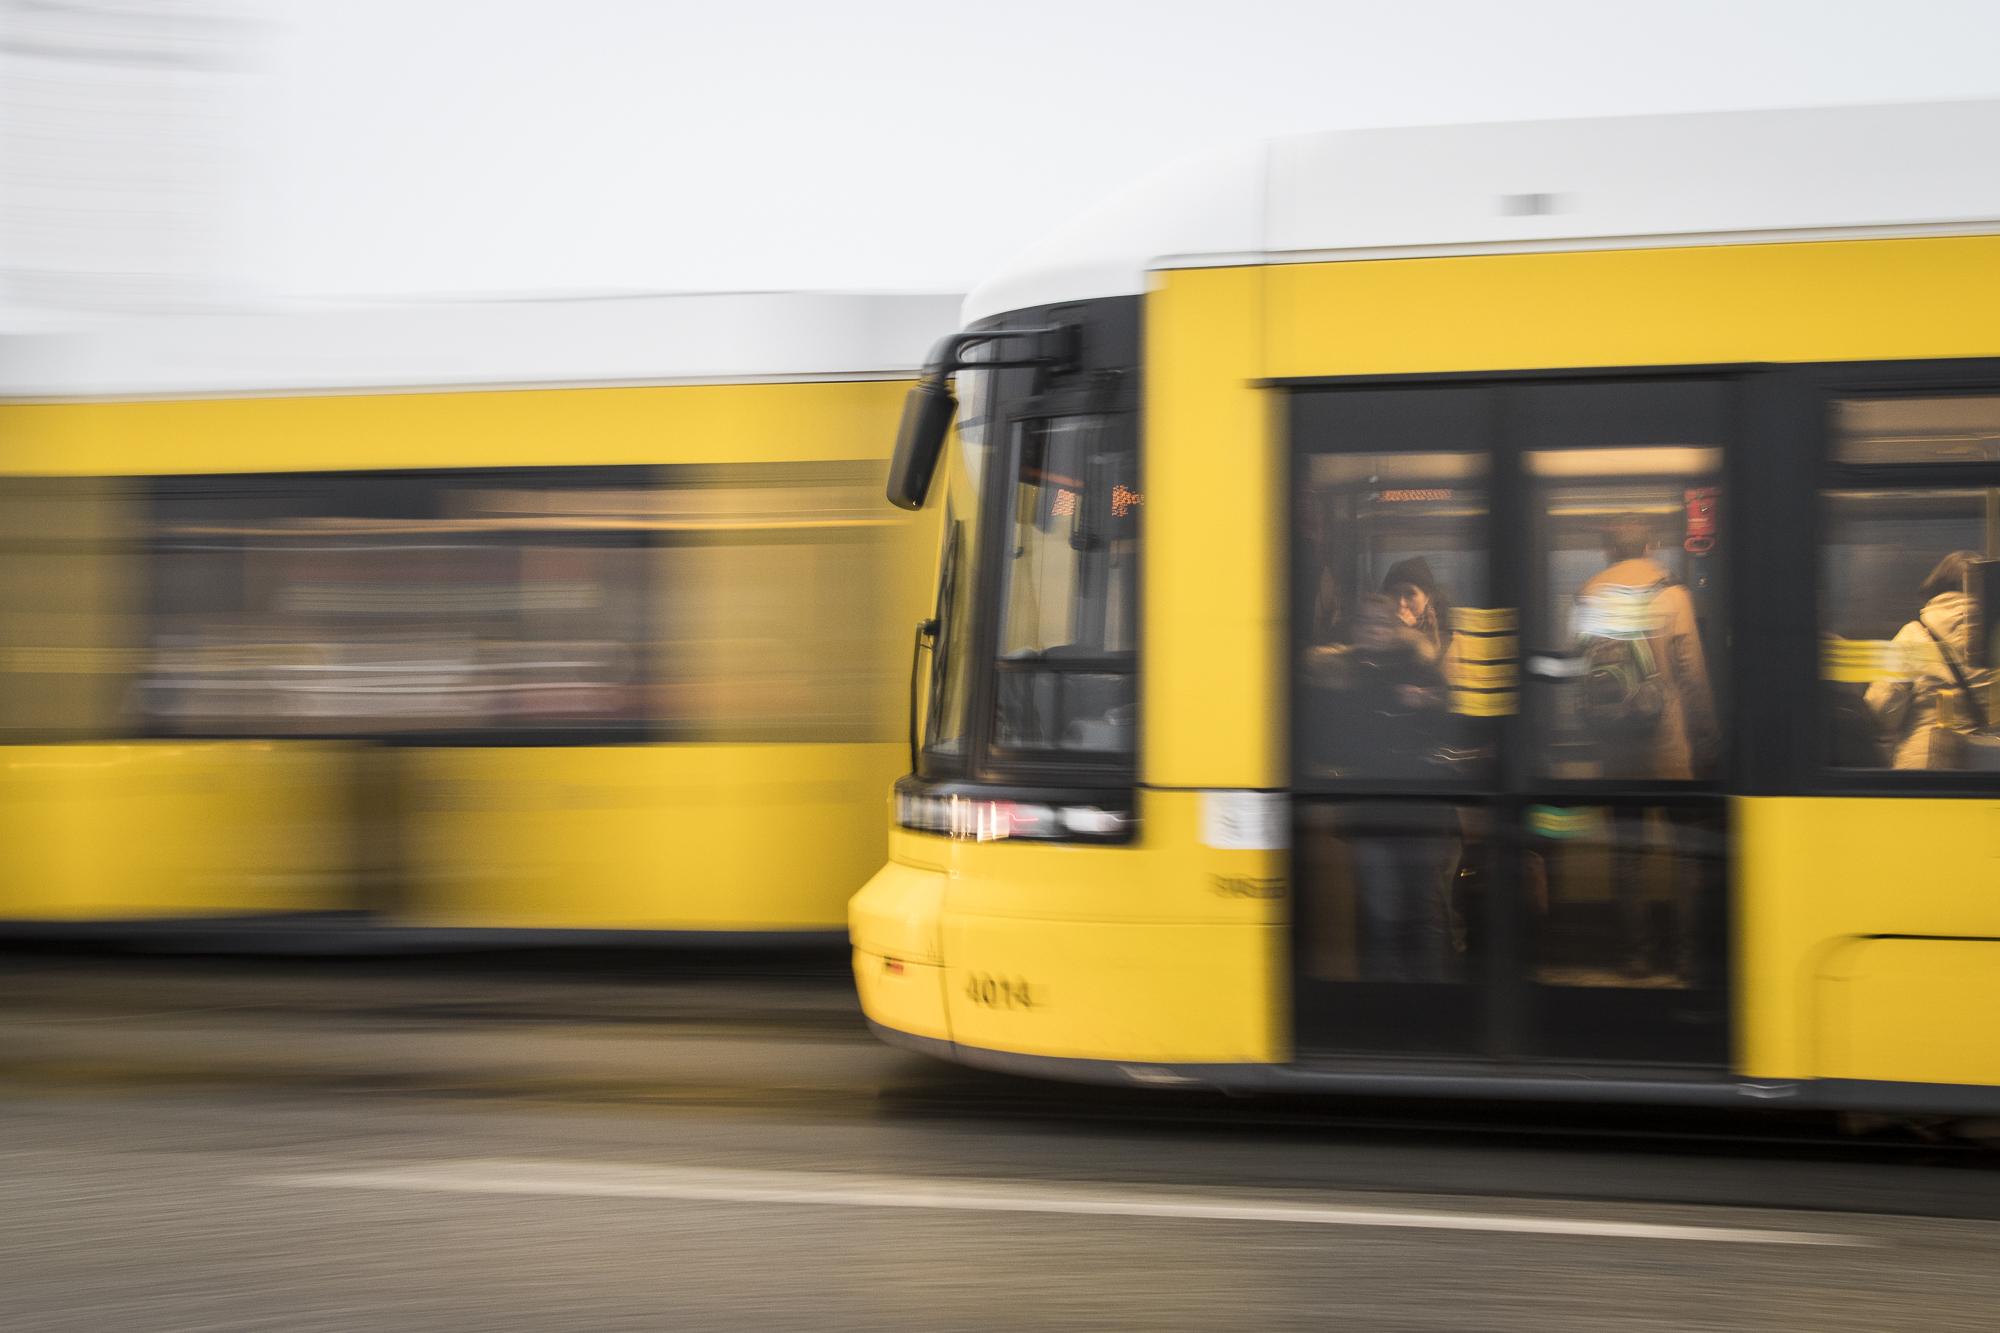 Berlin Flexity Trams  PHOTOGRAPHY: ALEXANDER J.E. BRADLEY • NIKON D500 • AF-S NIKKOR 14-24MM Ƒ/2.8G ED @ 24MM • Ƒ/9 • 1/8• ISO 400